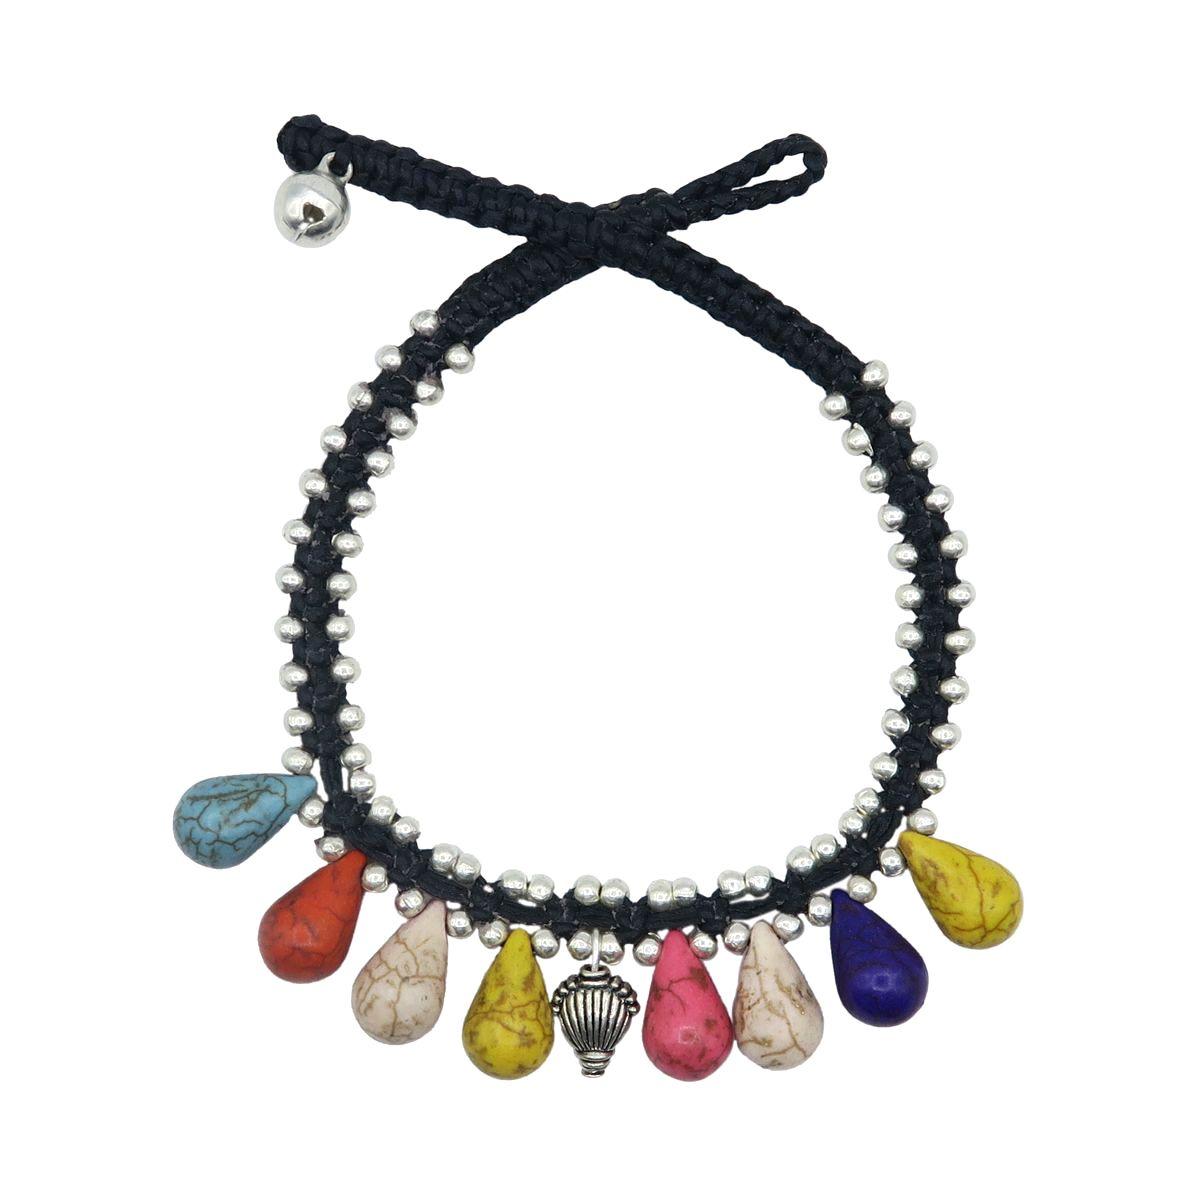 Magica Made in Bali Boho Jewelry